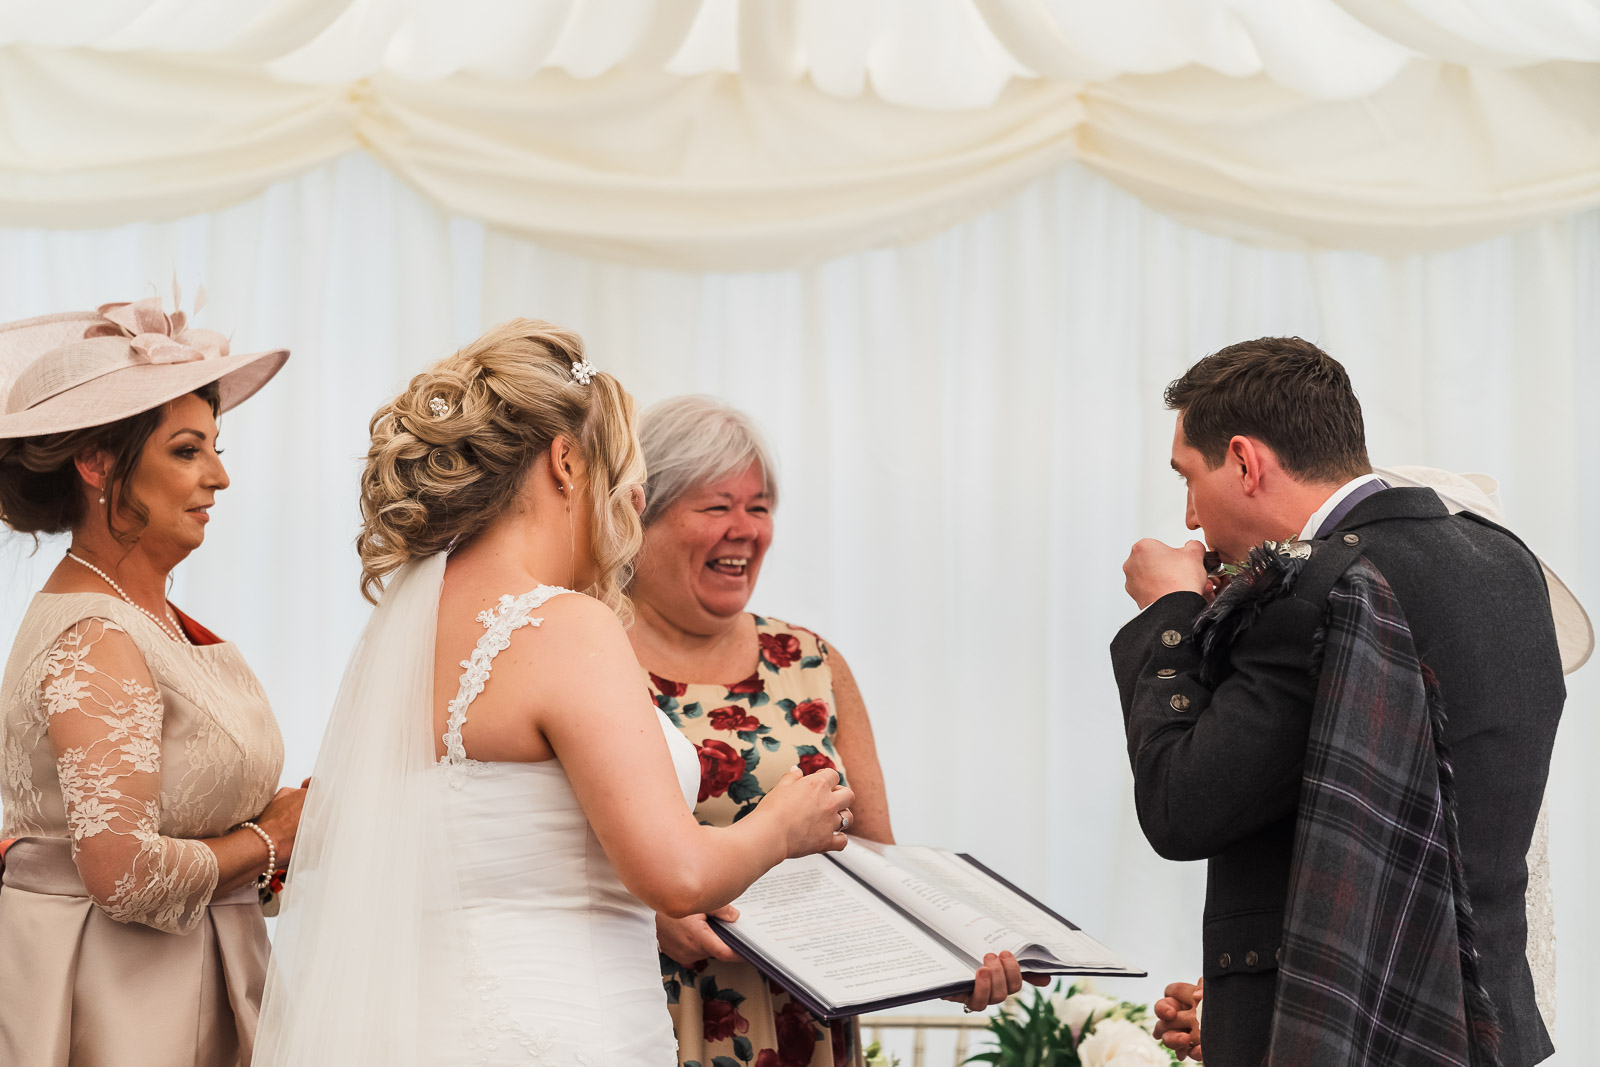 cornhill_castle_wedding_biggar_dearlyphotography (134 of 448).jpg